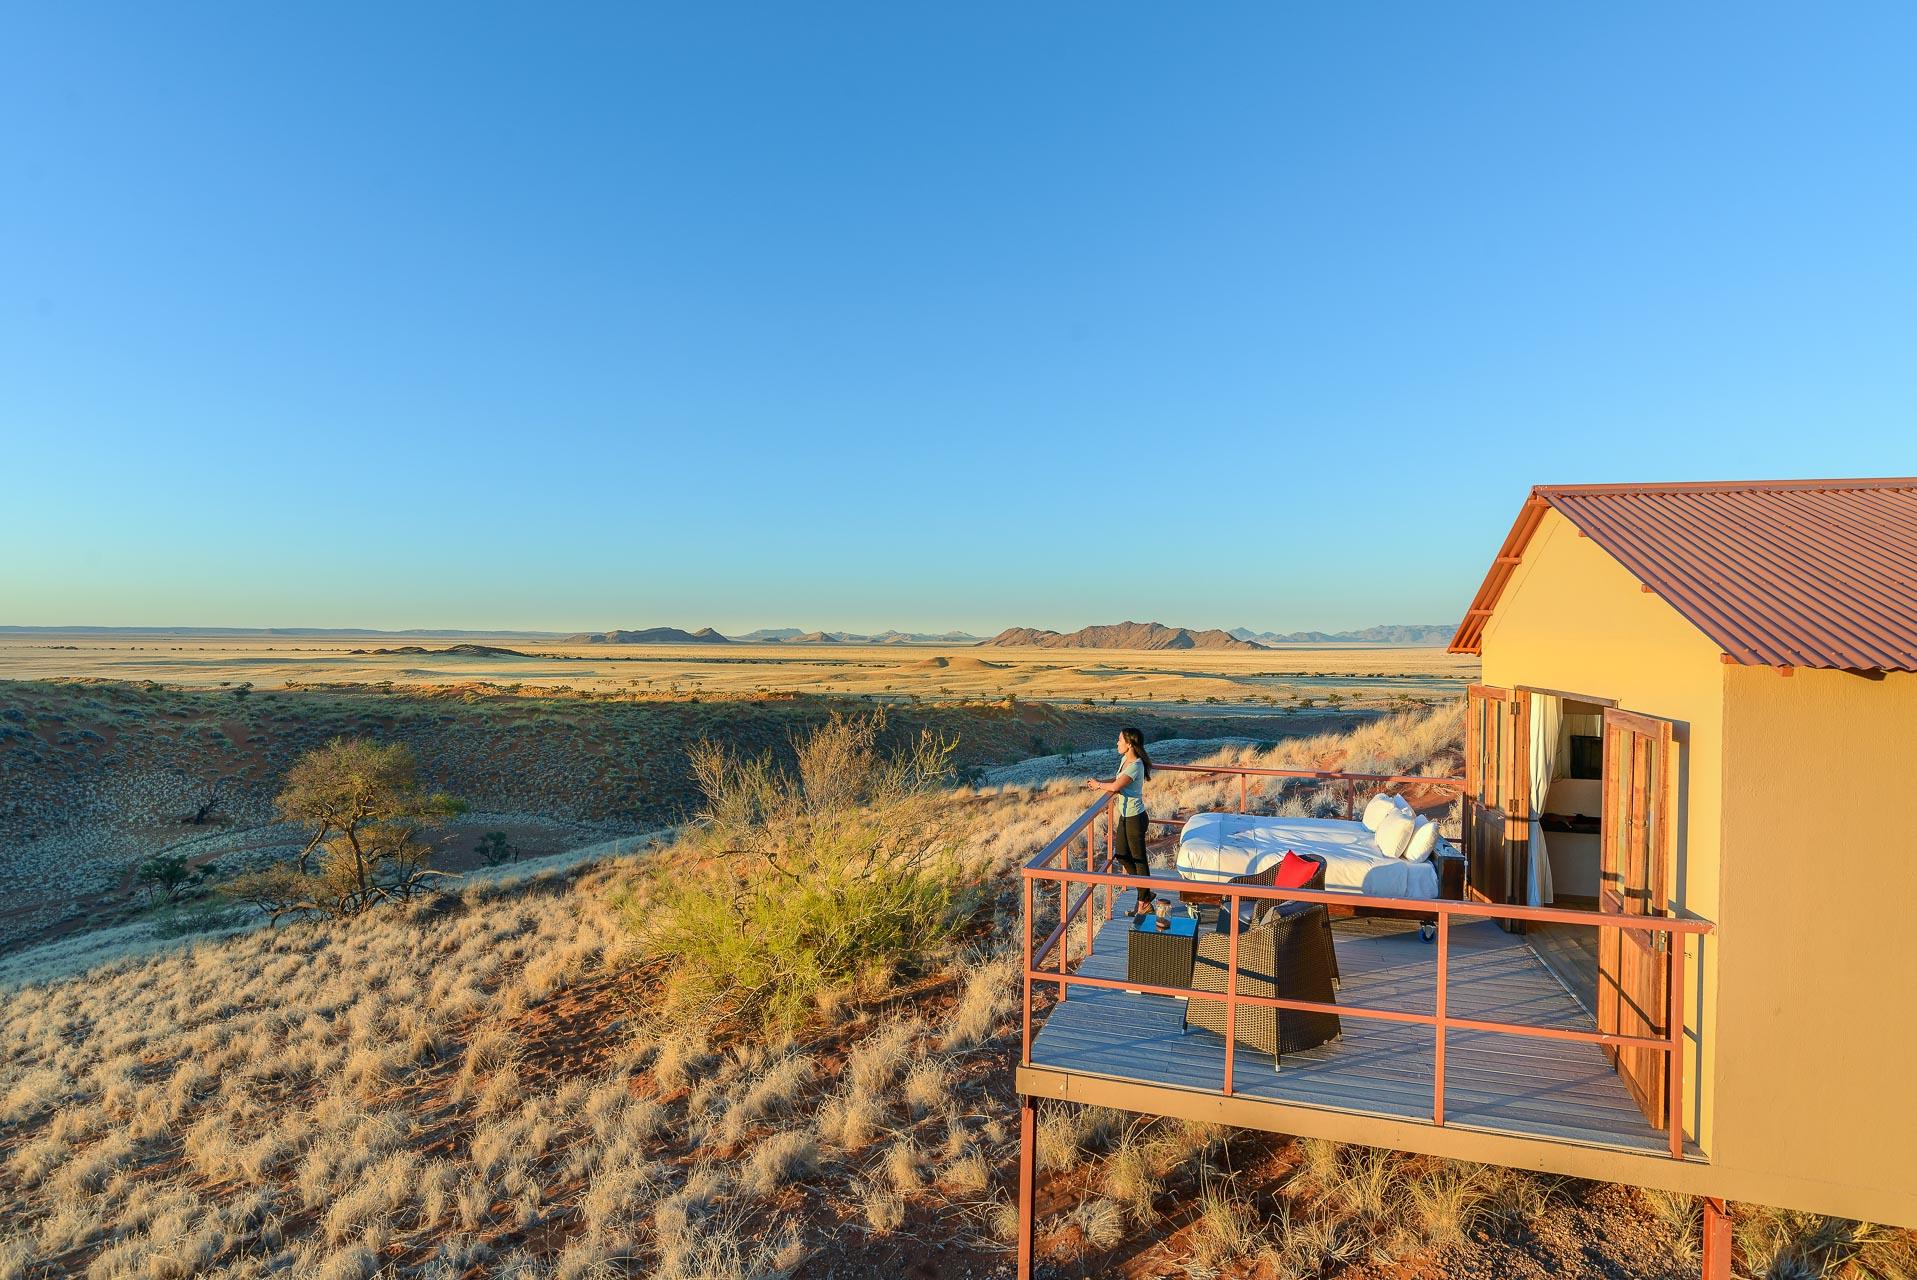 Namib-Dune-Star-Camp-15